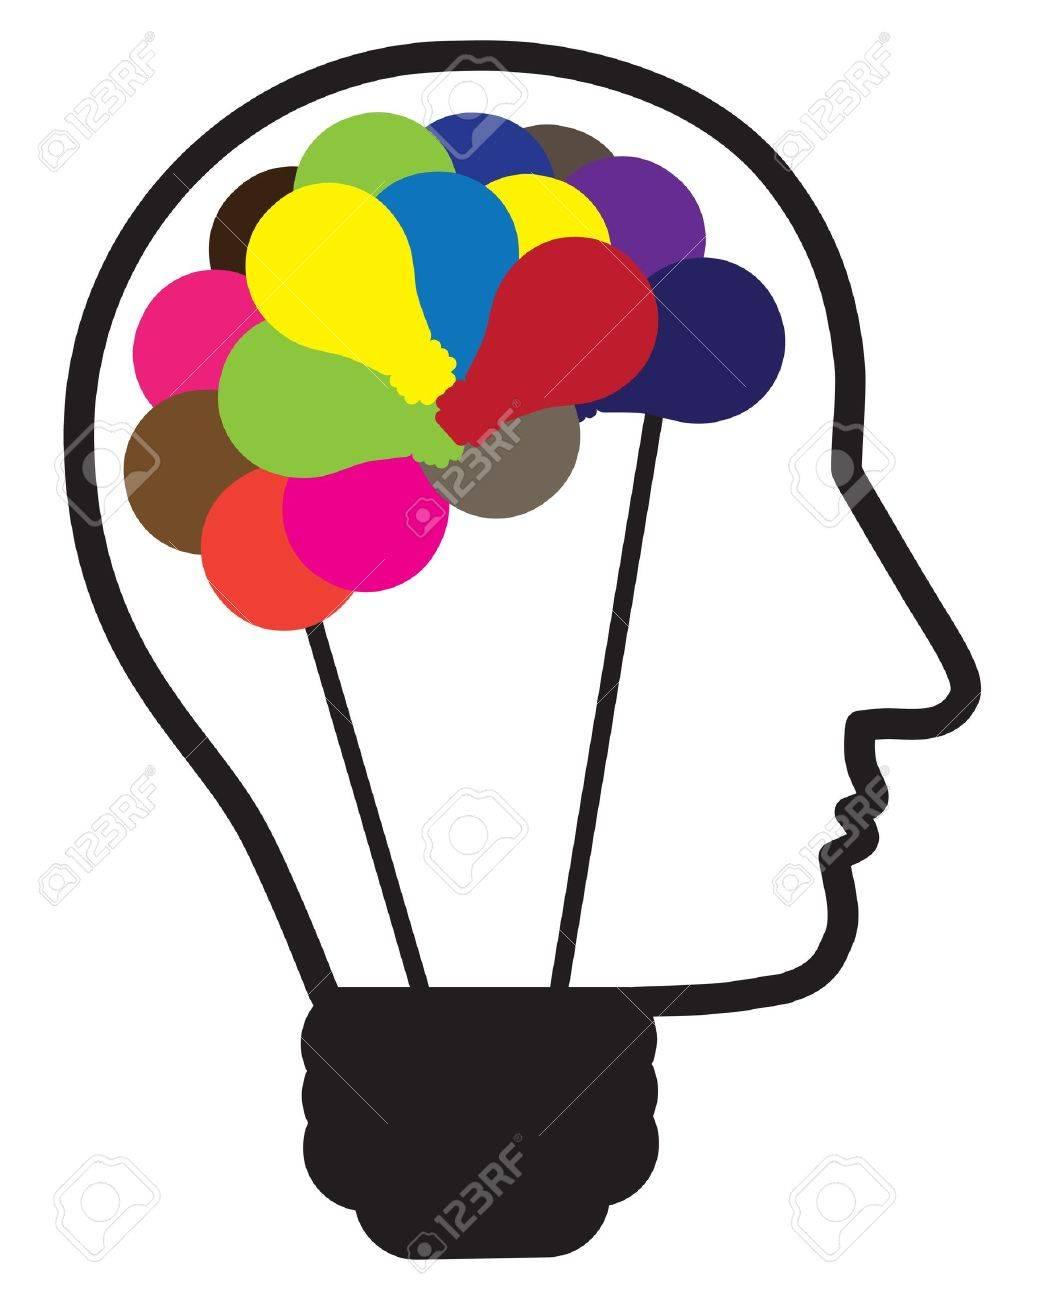 Illustration Of Idea Light Bulb As Human Head Creating Ideas Shown By Multicolor Bulbs In Shape